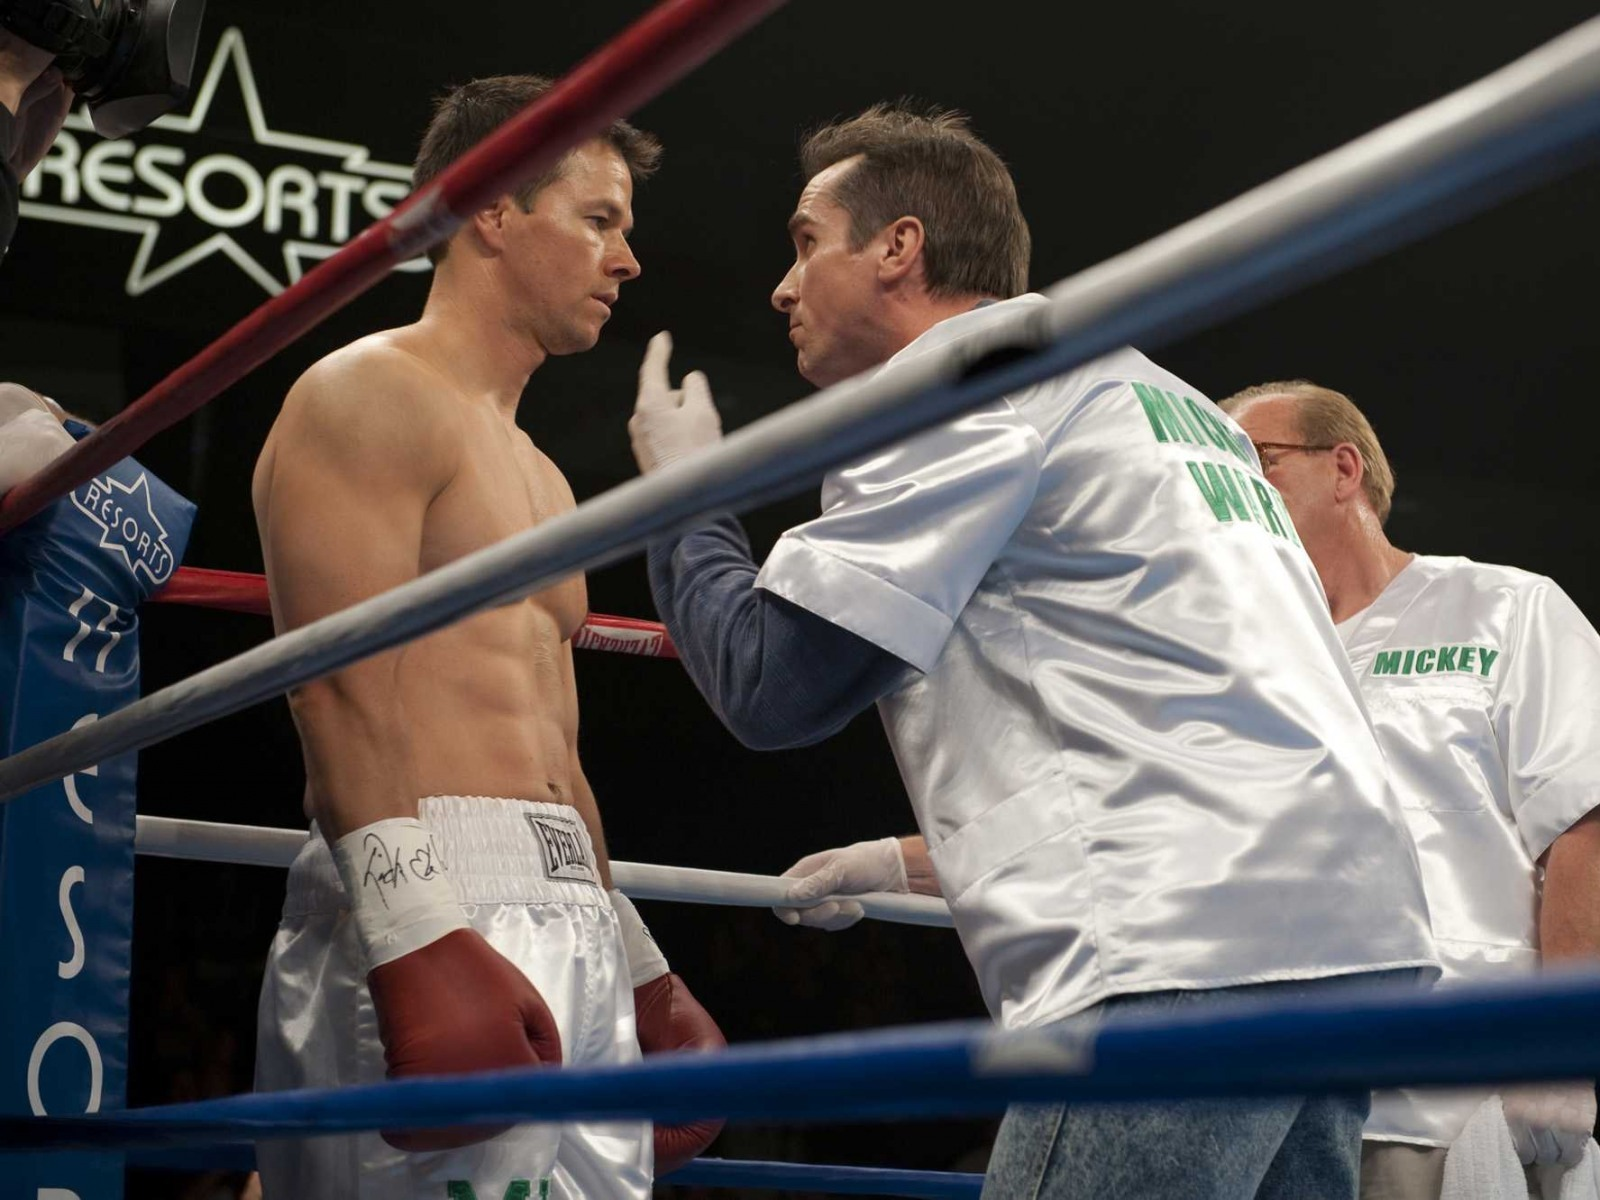 http://4.bp.blogspot.com/-sQRuVea-Uso/TtxHS0S-_MI/AAAAAAAAAgo/hU1W8aj5FtE/s1600/boxing-wallpaper-hd-6-719168.jpg